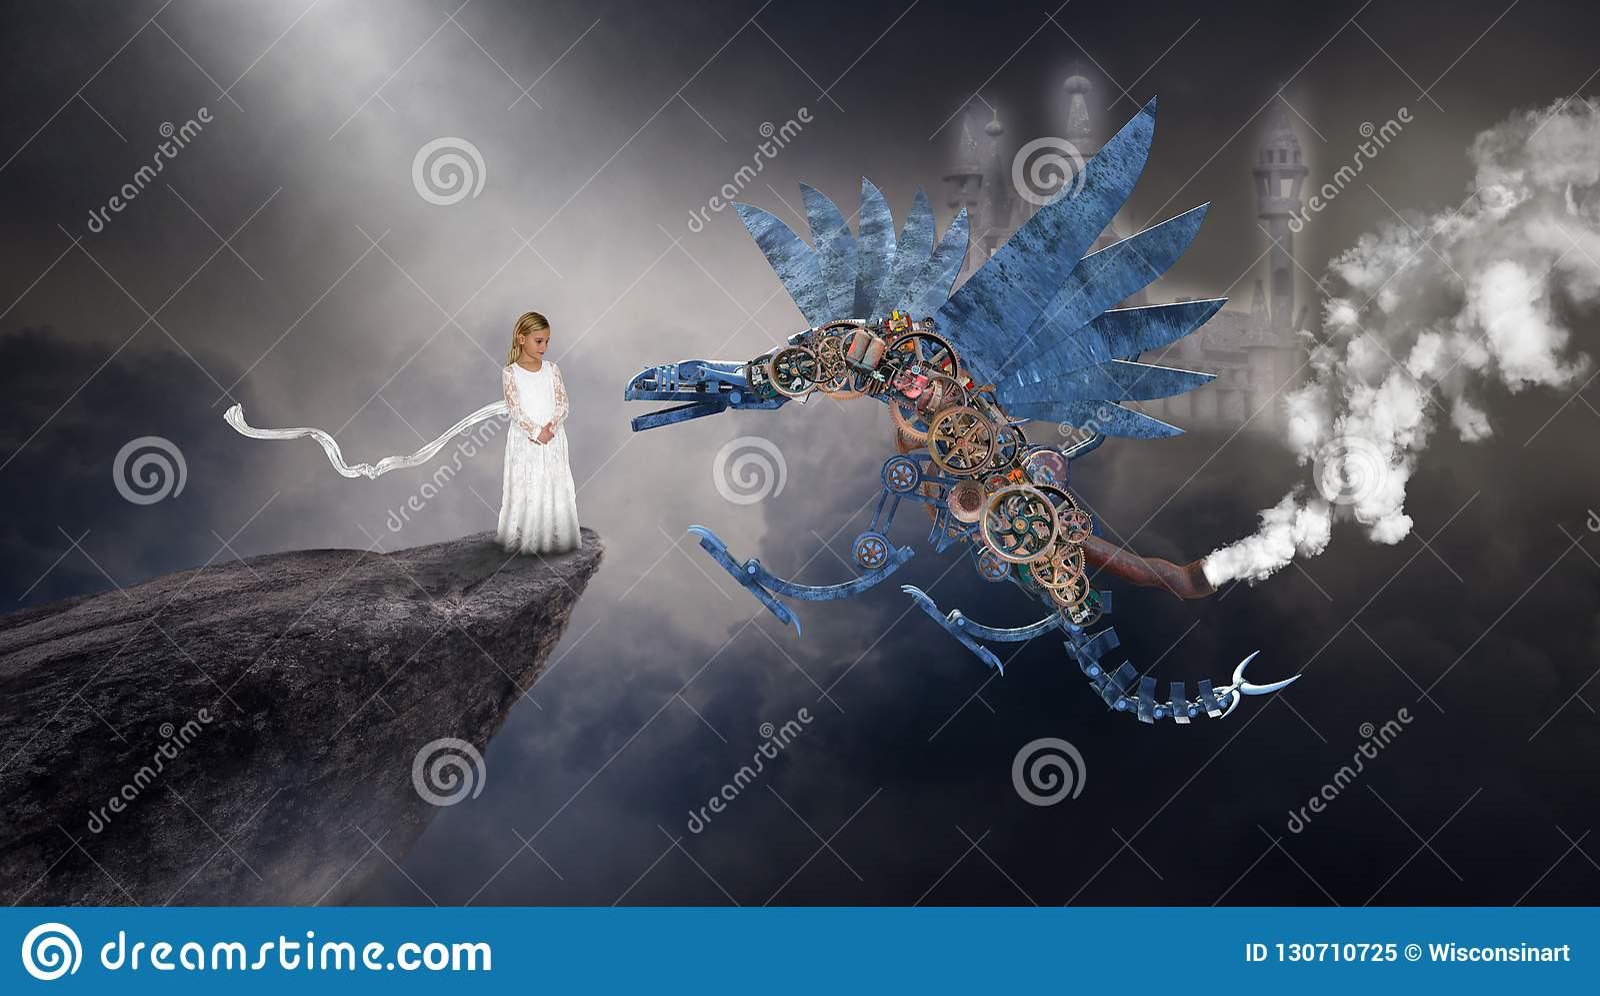 Dragon surréaliste de Steampunk, imagination, imagination, jeune fille